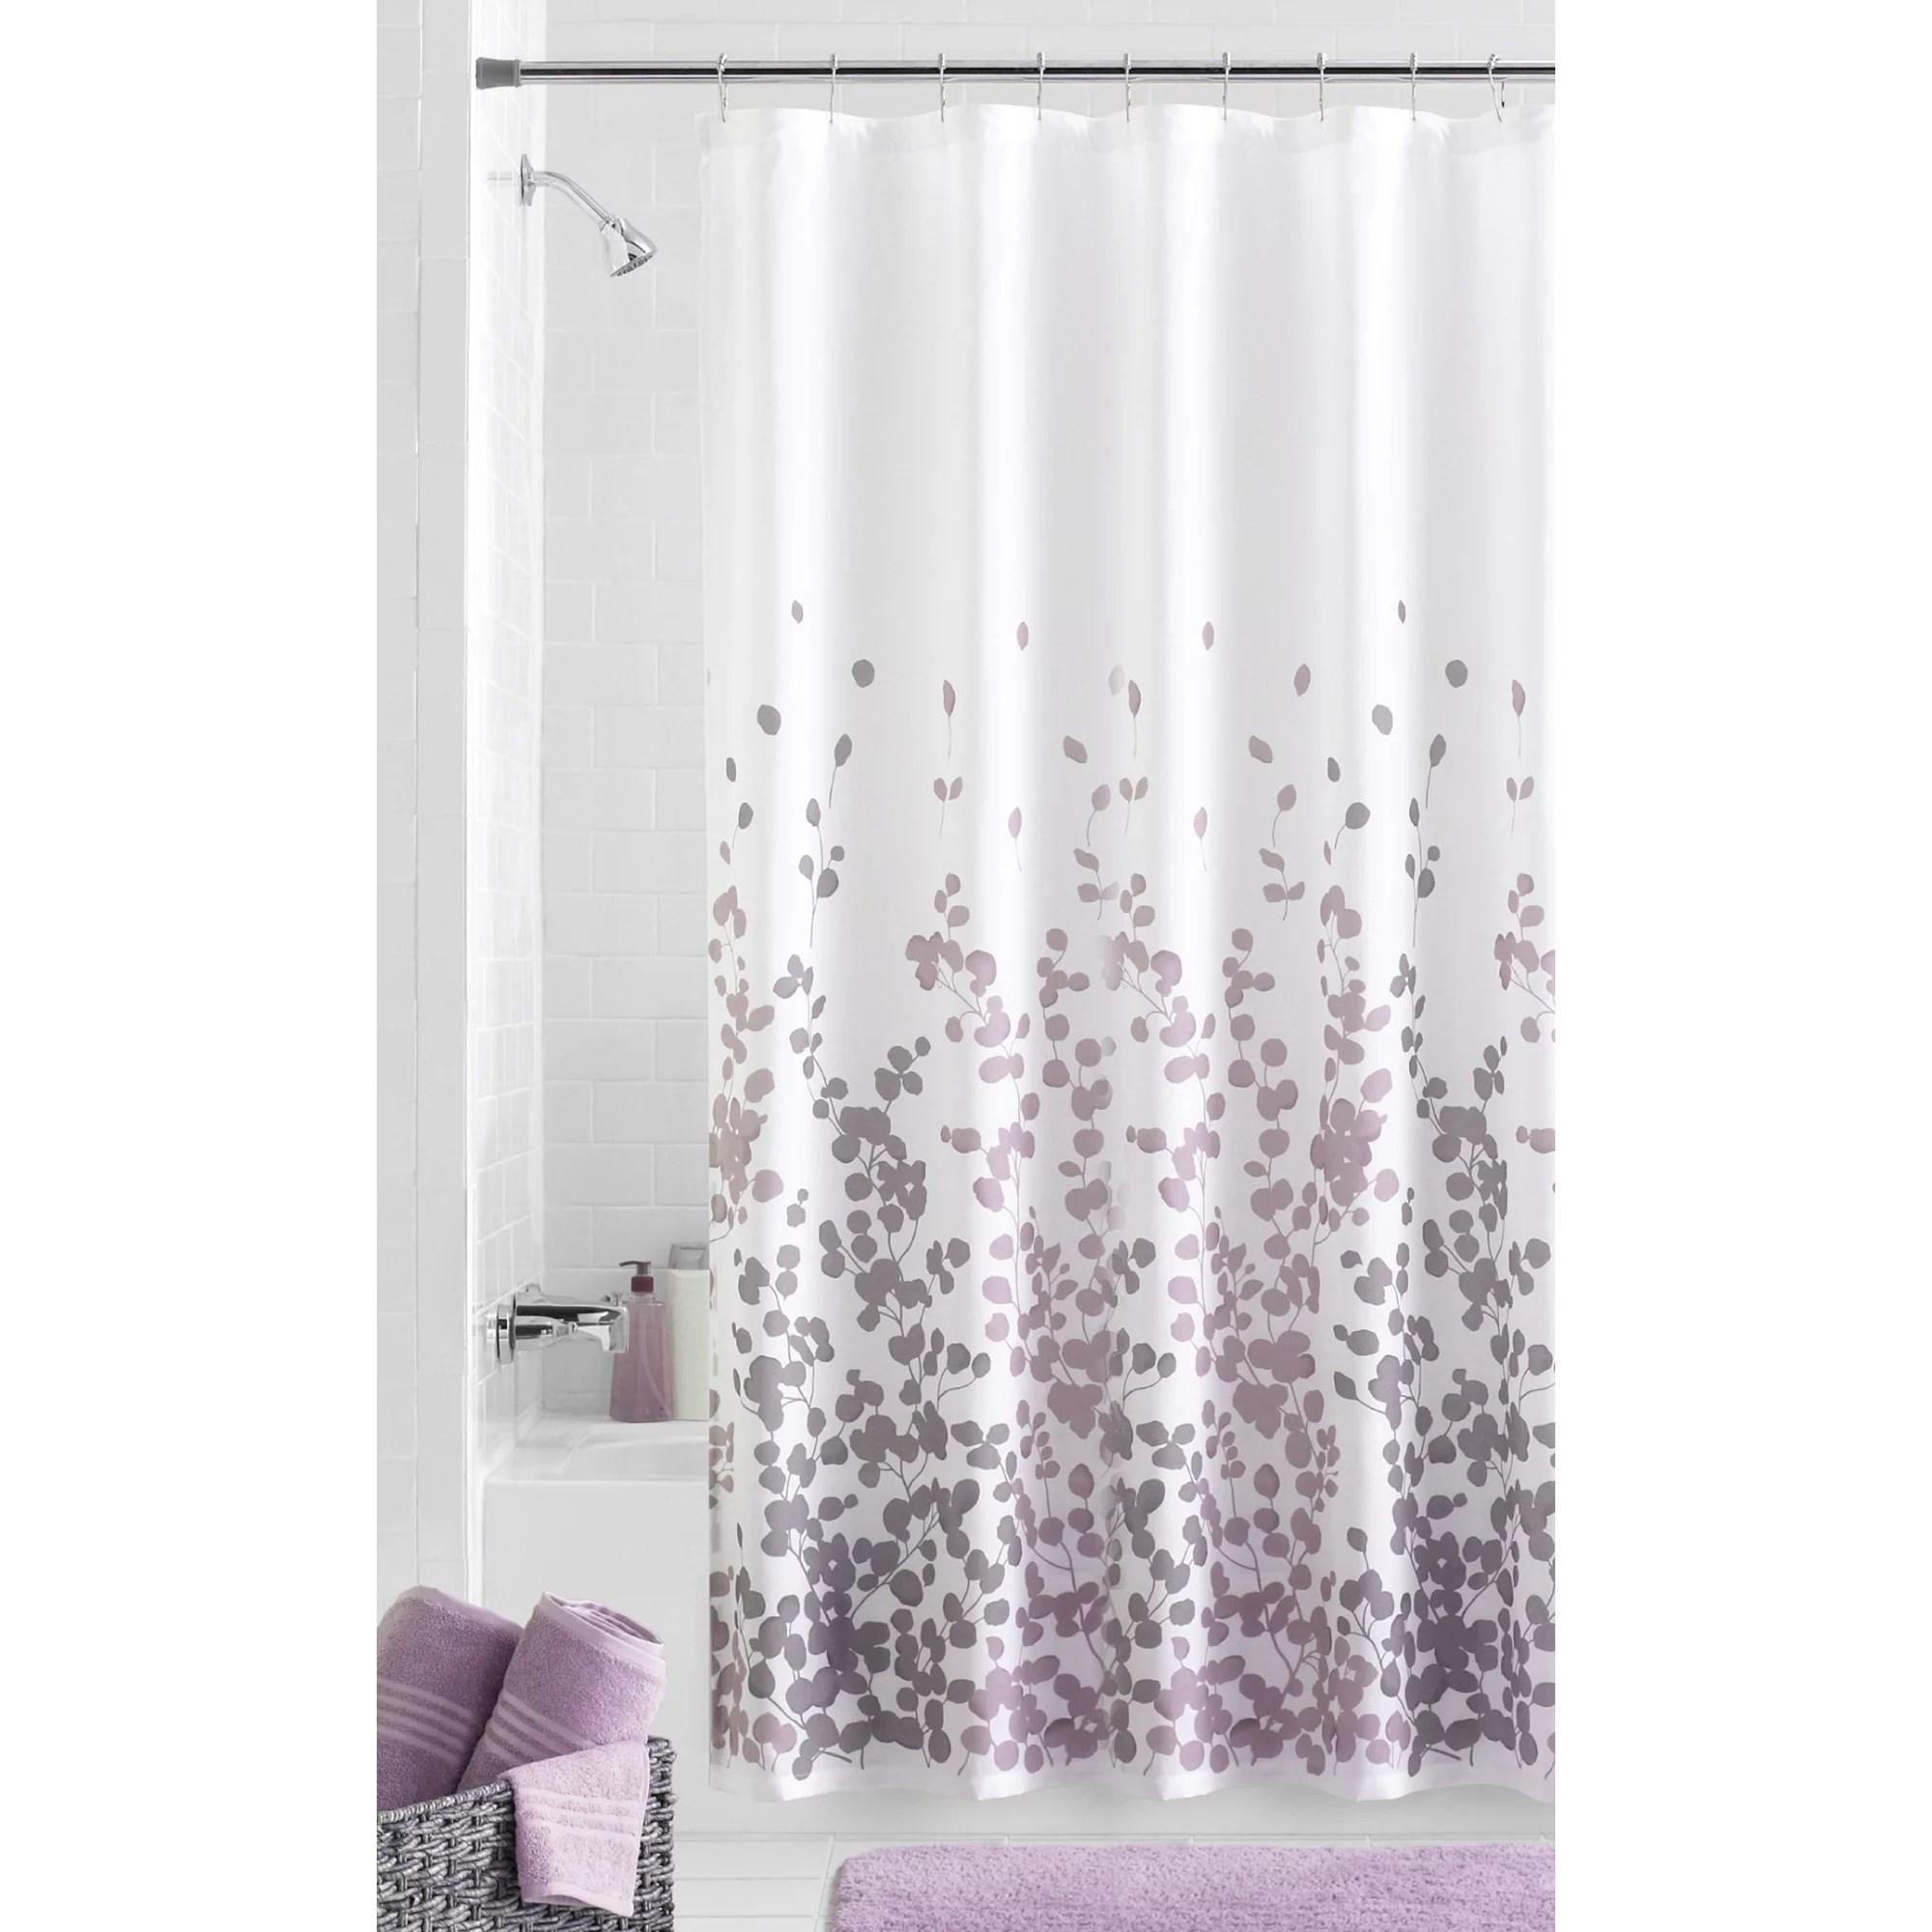 mainstays sylvia faux silk purple grey and white fabric shower curtain 70 x 72 walmart com